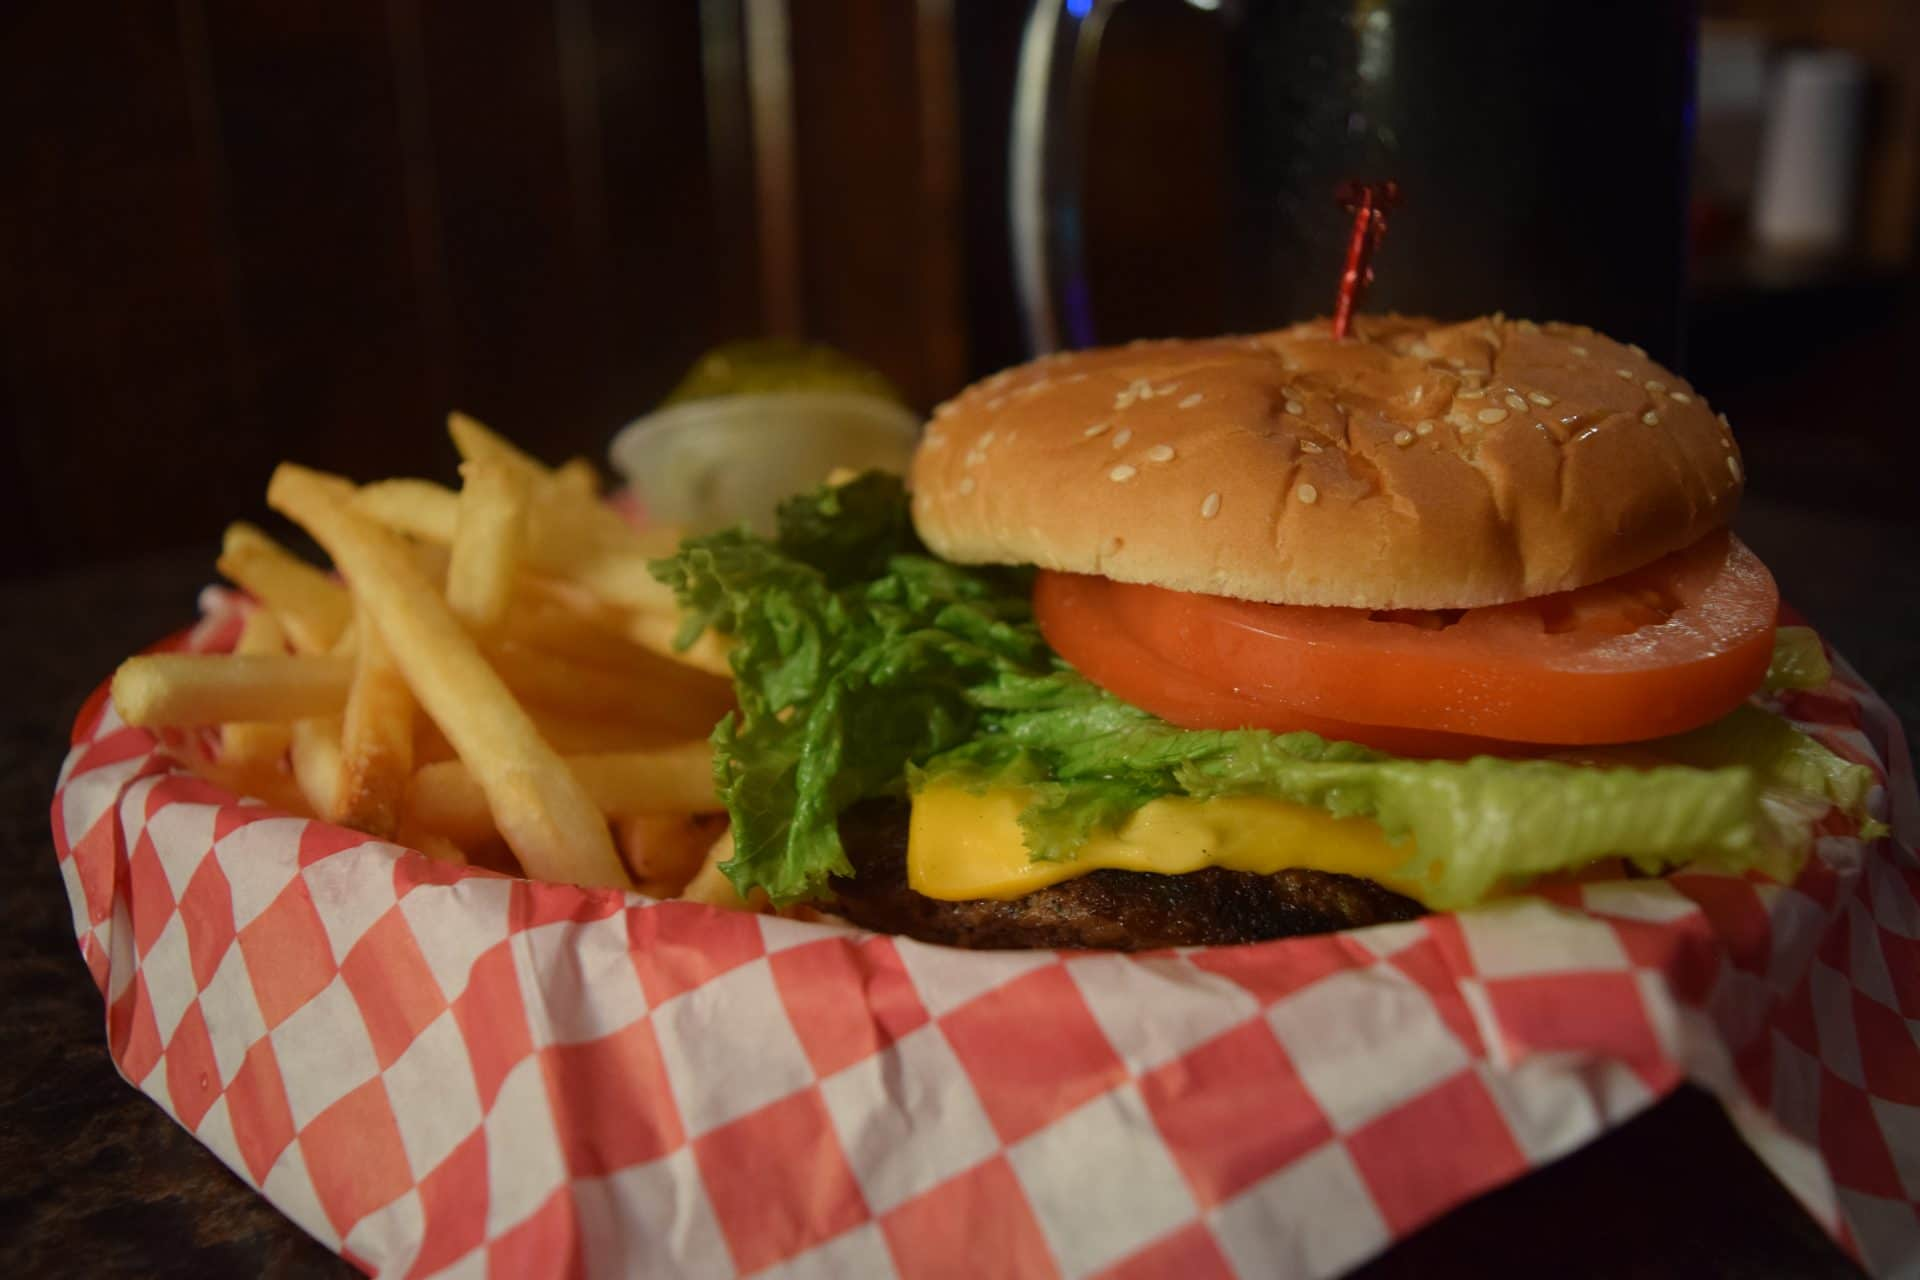 rons place kenosha, best burger kenosha, burgers in kenosha